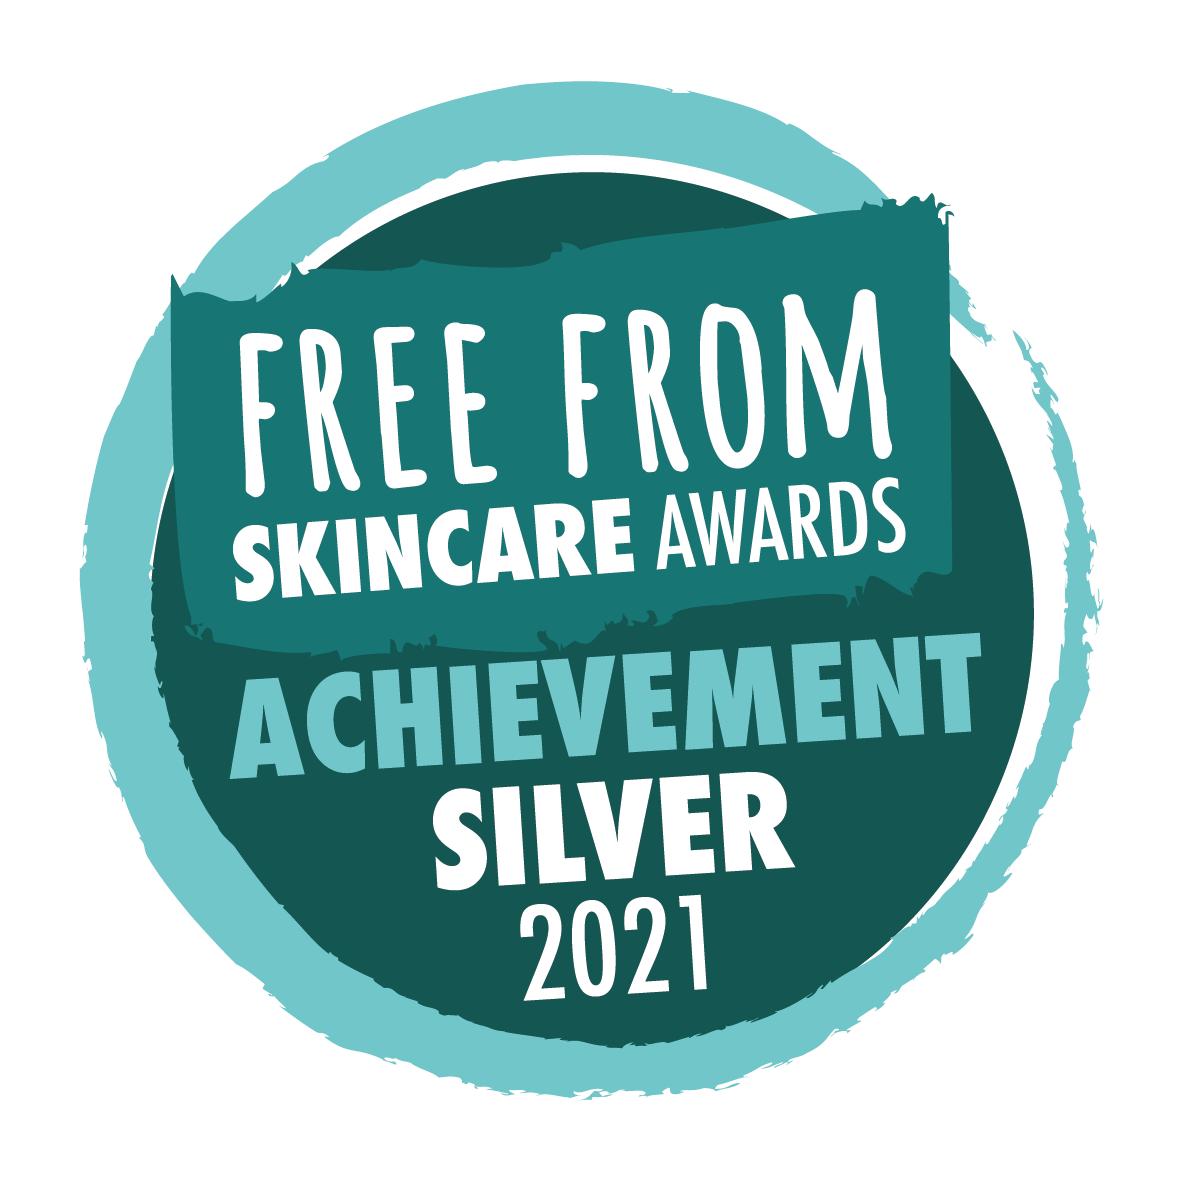 ffsa-achievement-2021-web-white-background-silver.png